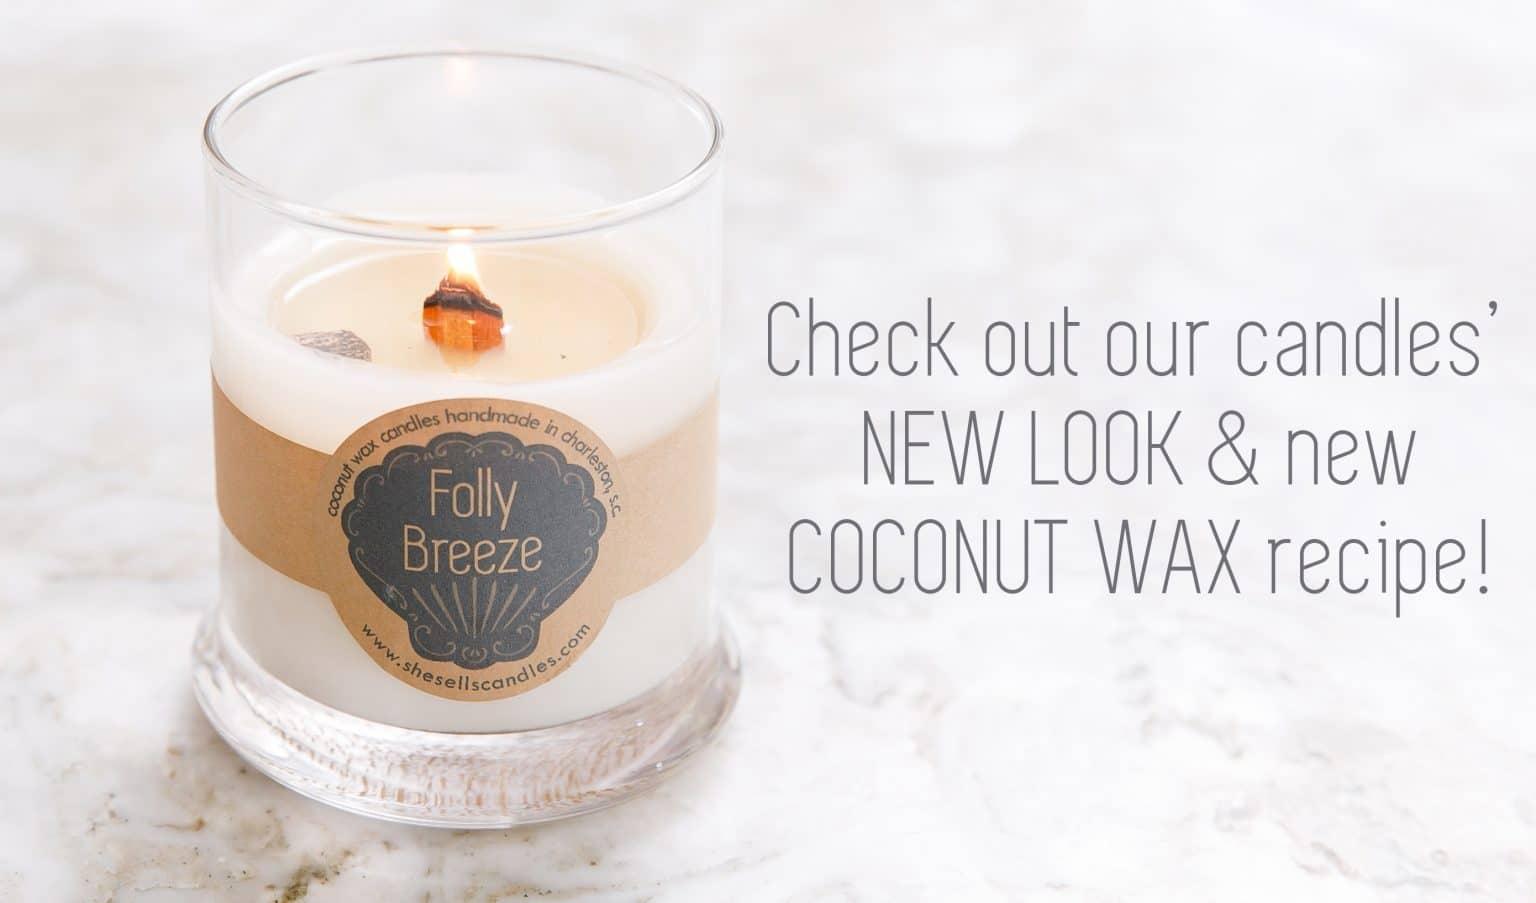 shop coconut wax candles